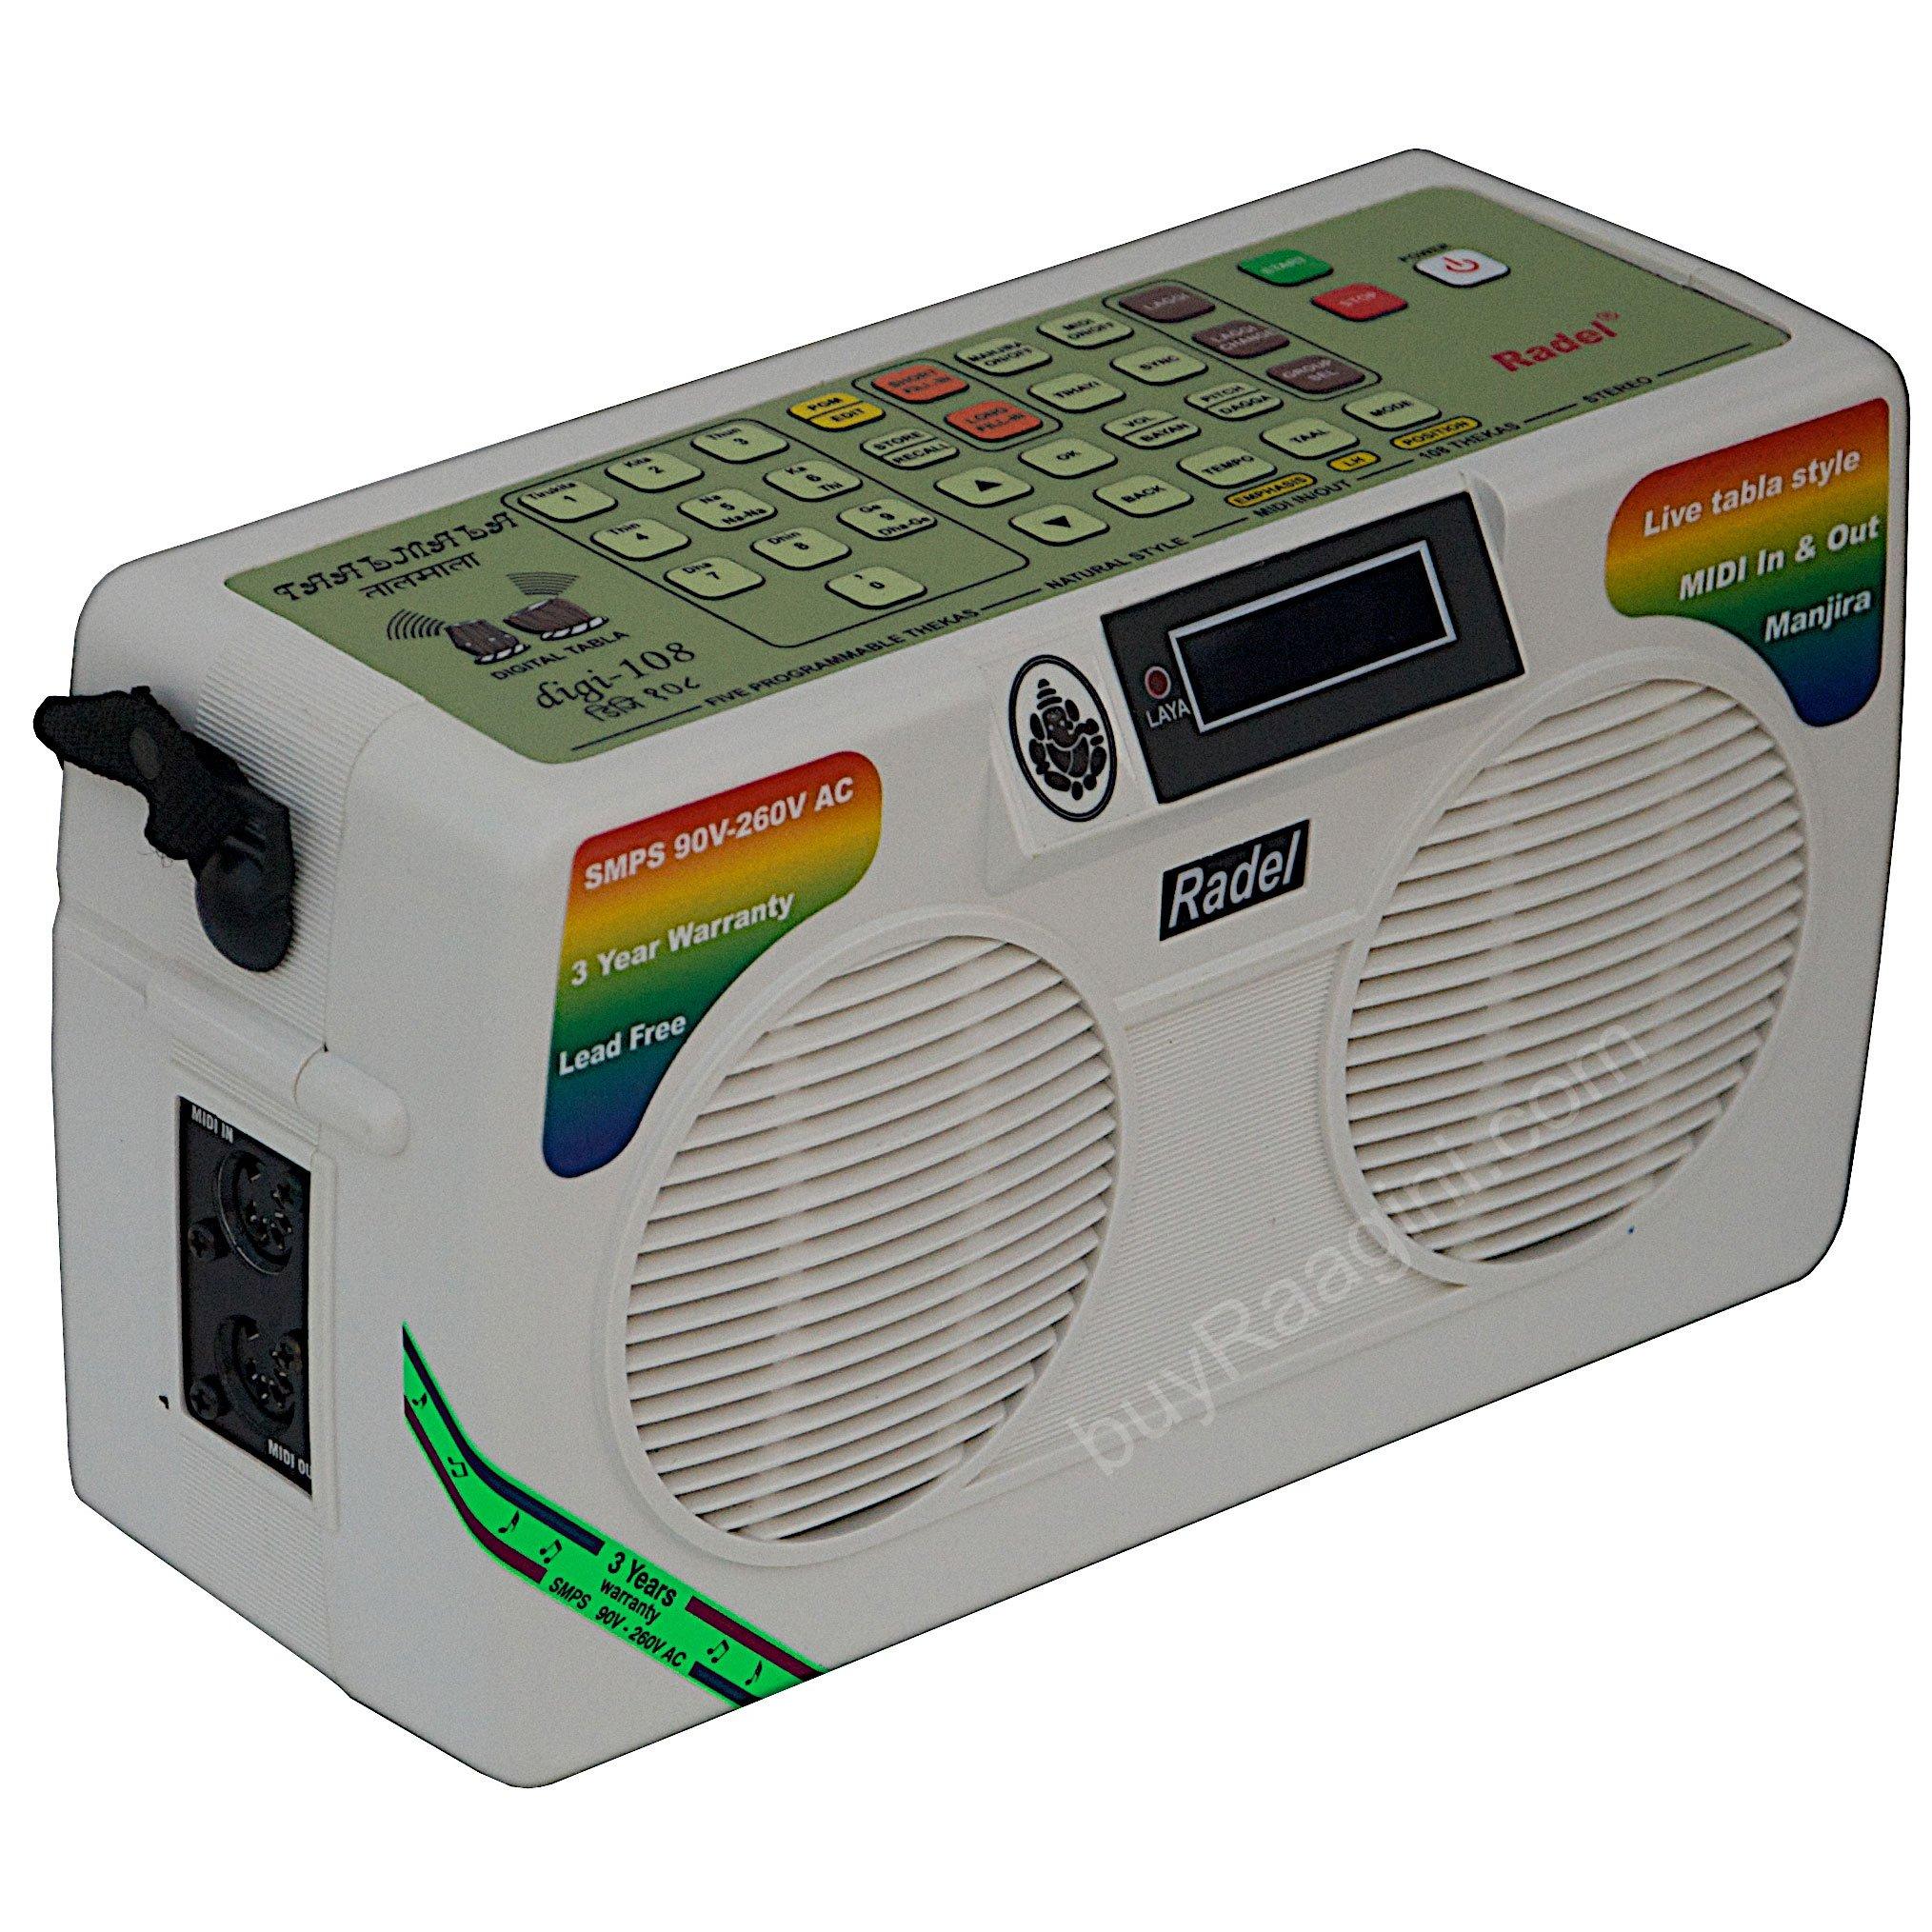 Electronic Tabla - RADEL Taalmala - Digi 108, Electronic Tabla & Manjira - Tabla Sampler, DJ Tabla Sound Machine, Instruction Manual, Power Cord, Bag (US-PDI-AAF) by Radel at buyRaagini.com (Image #2)